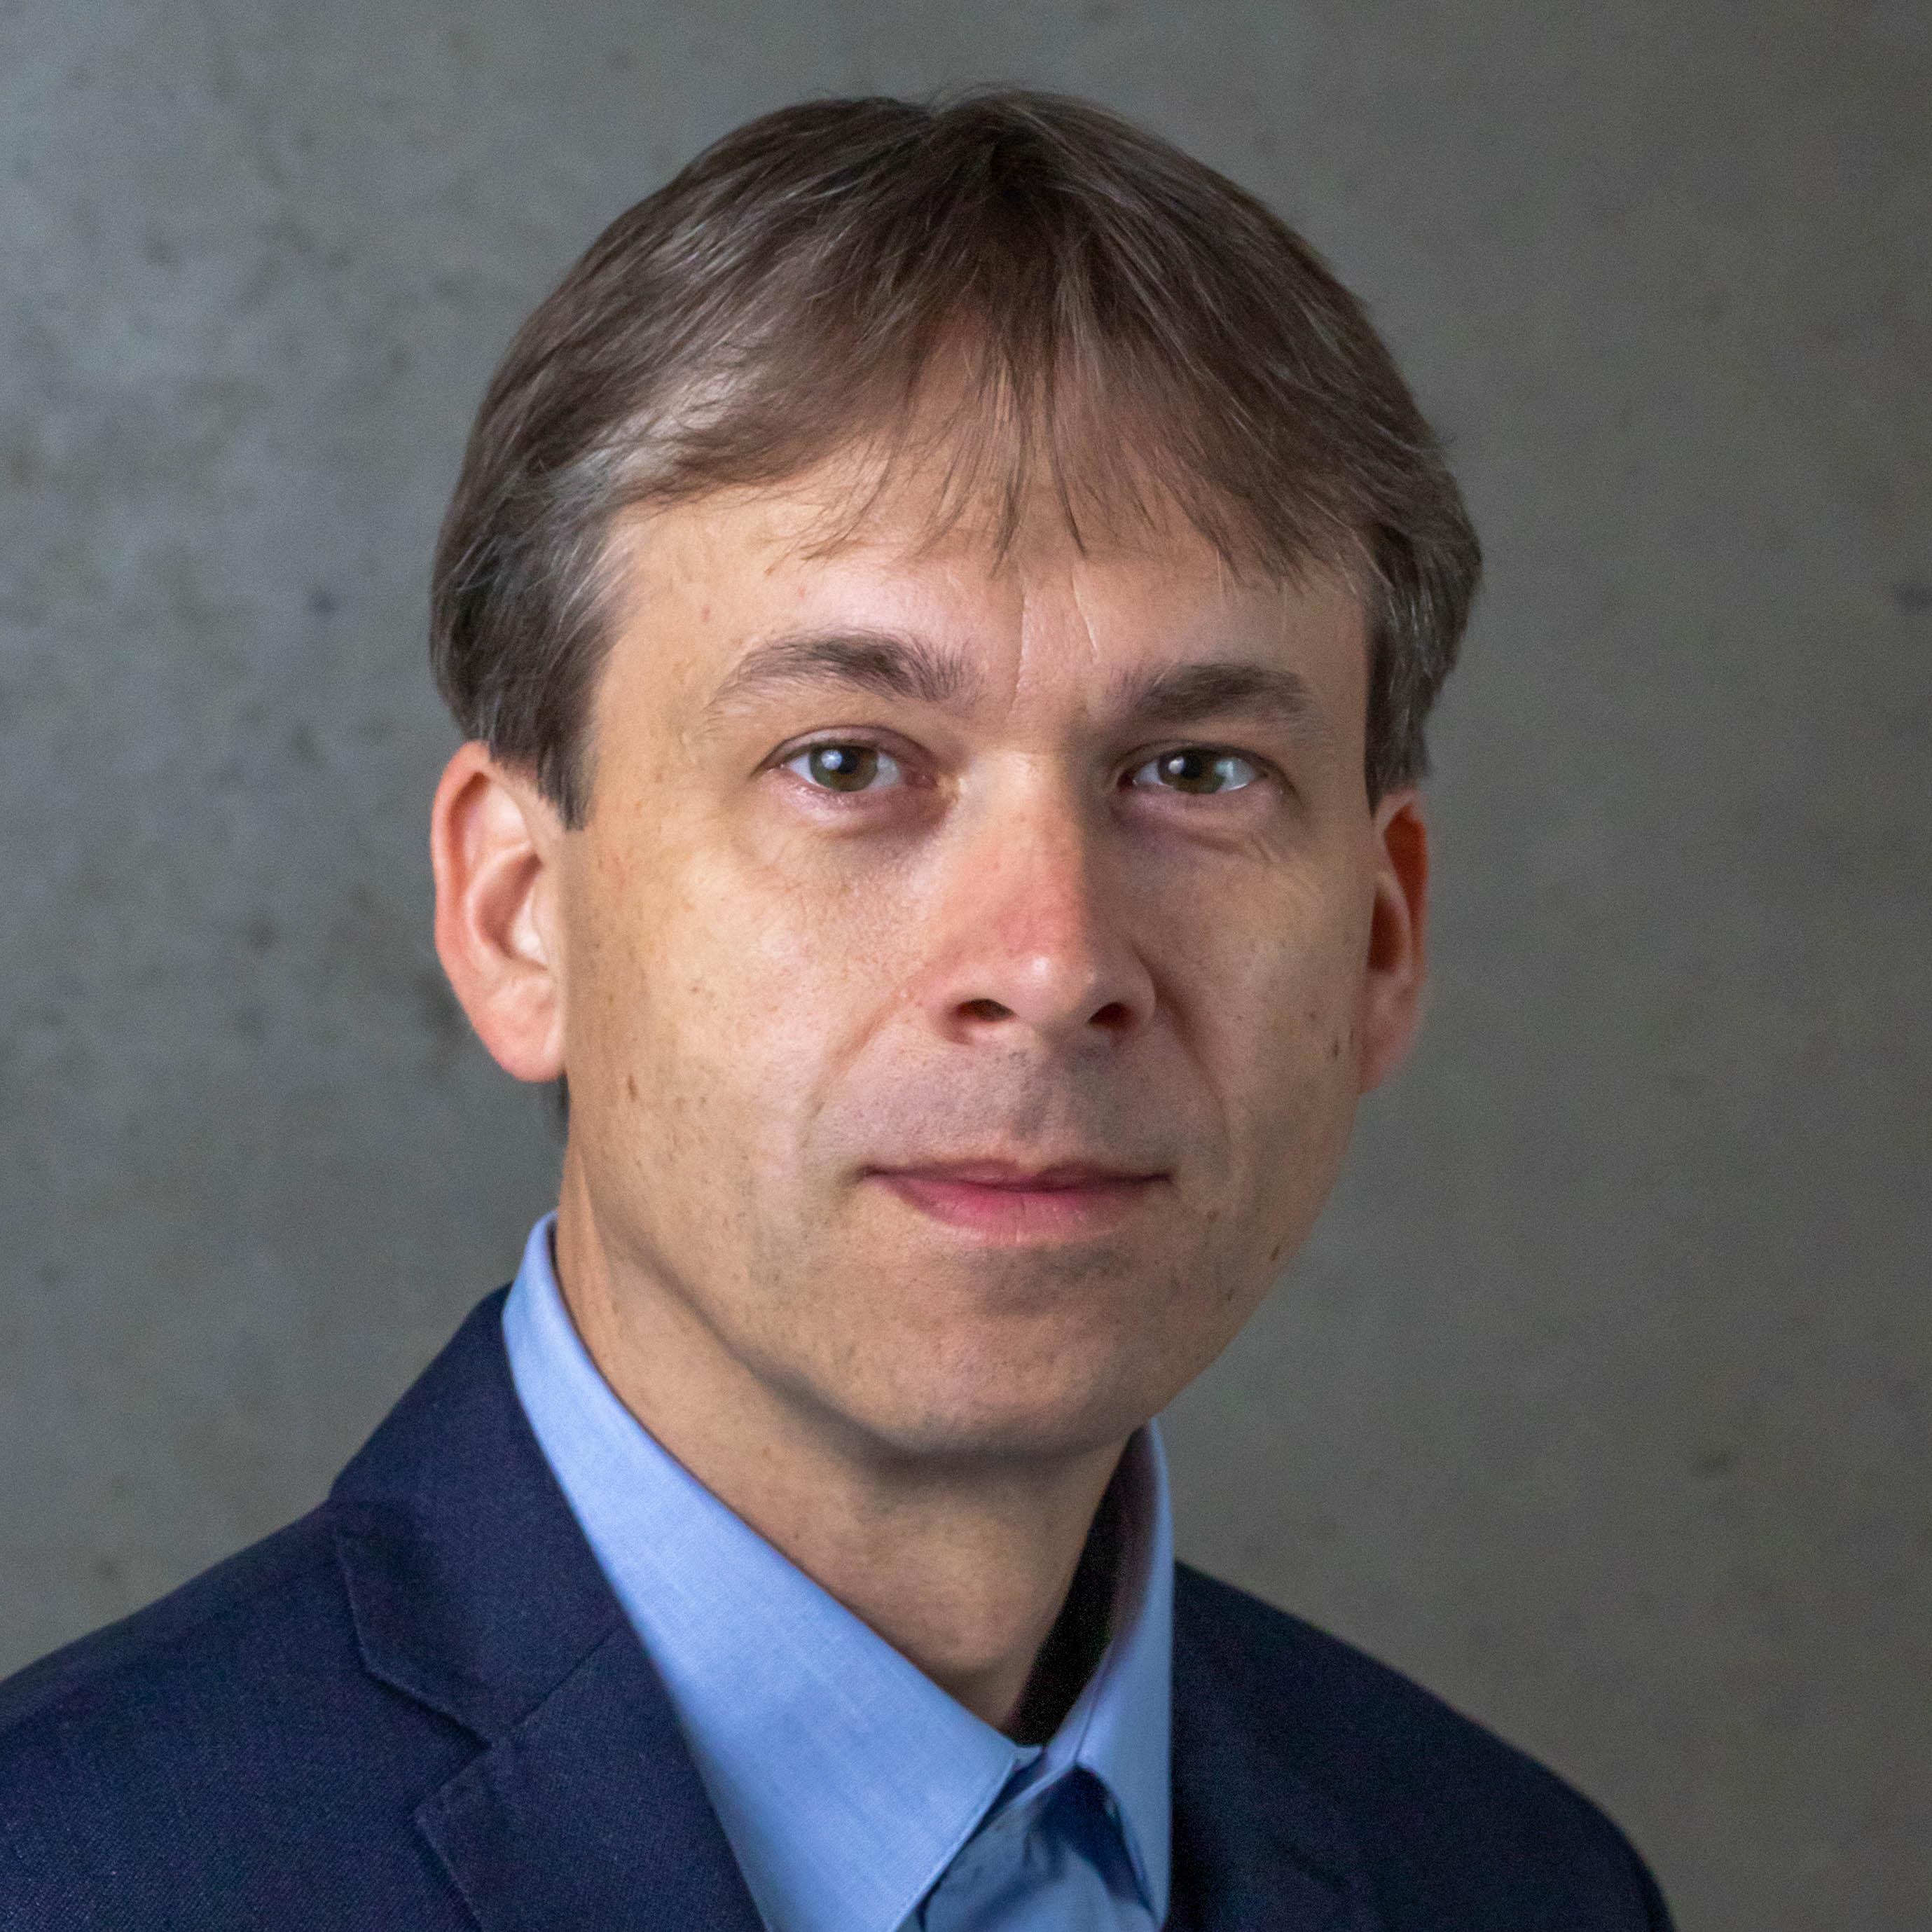 Pavel Prokop